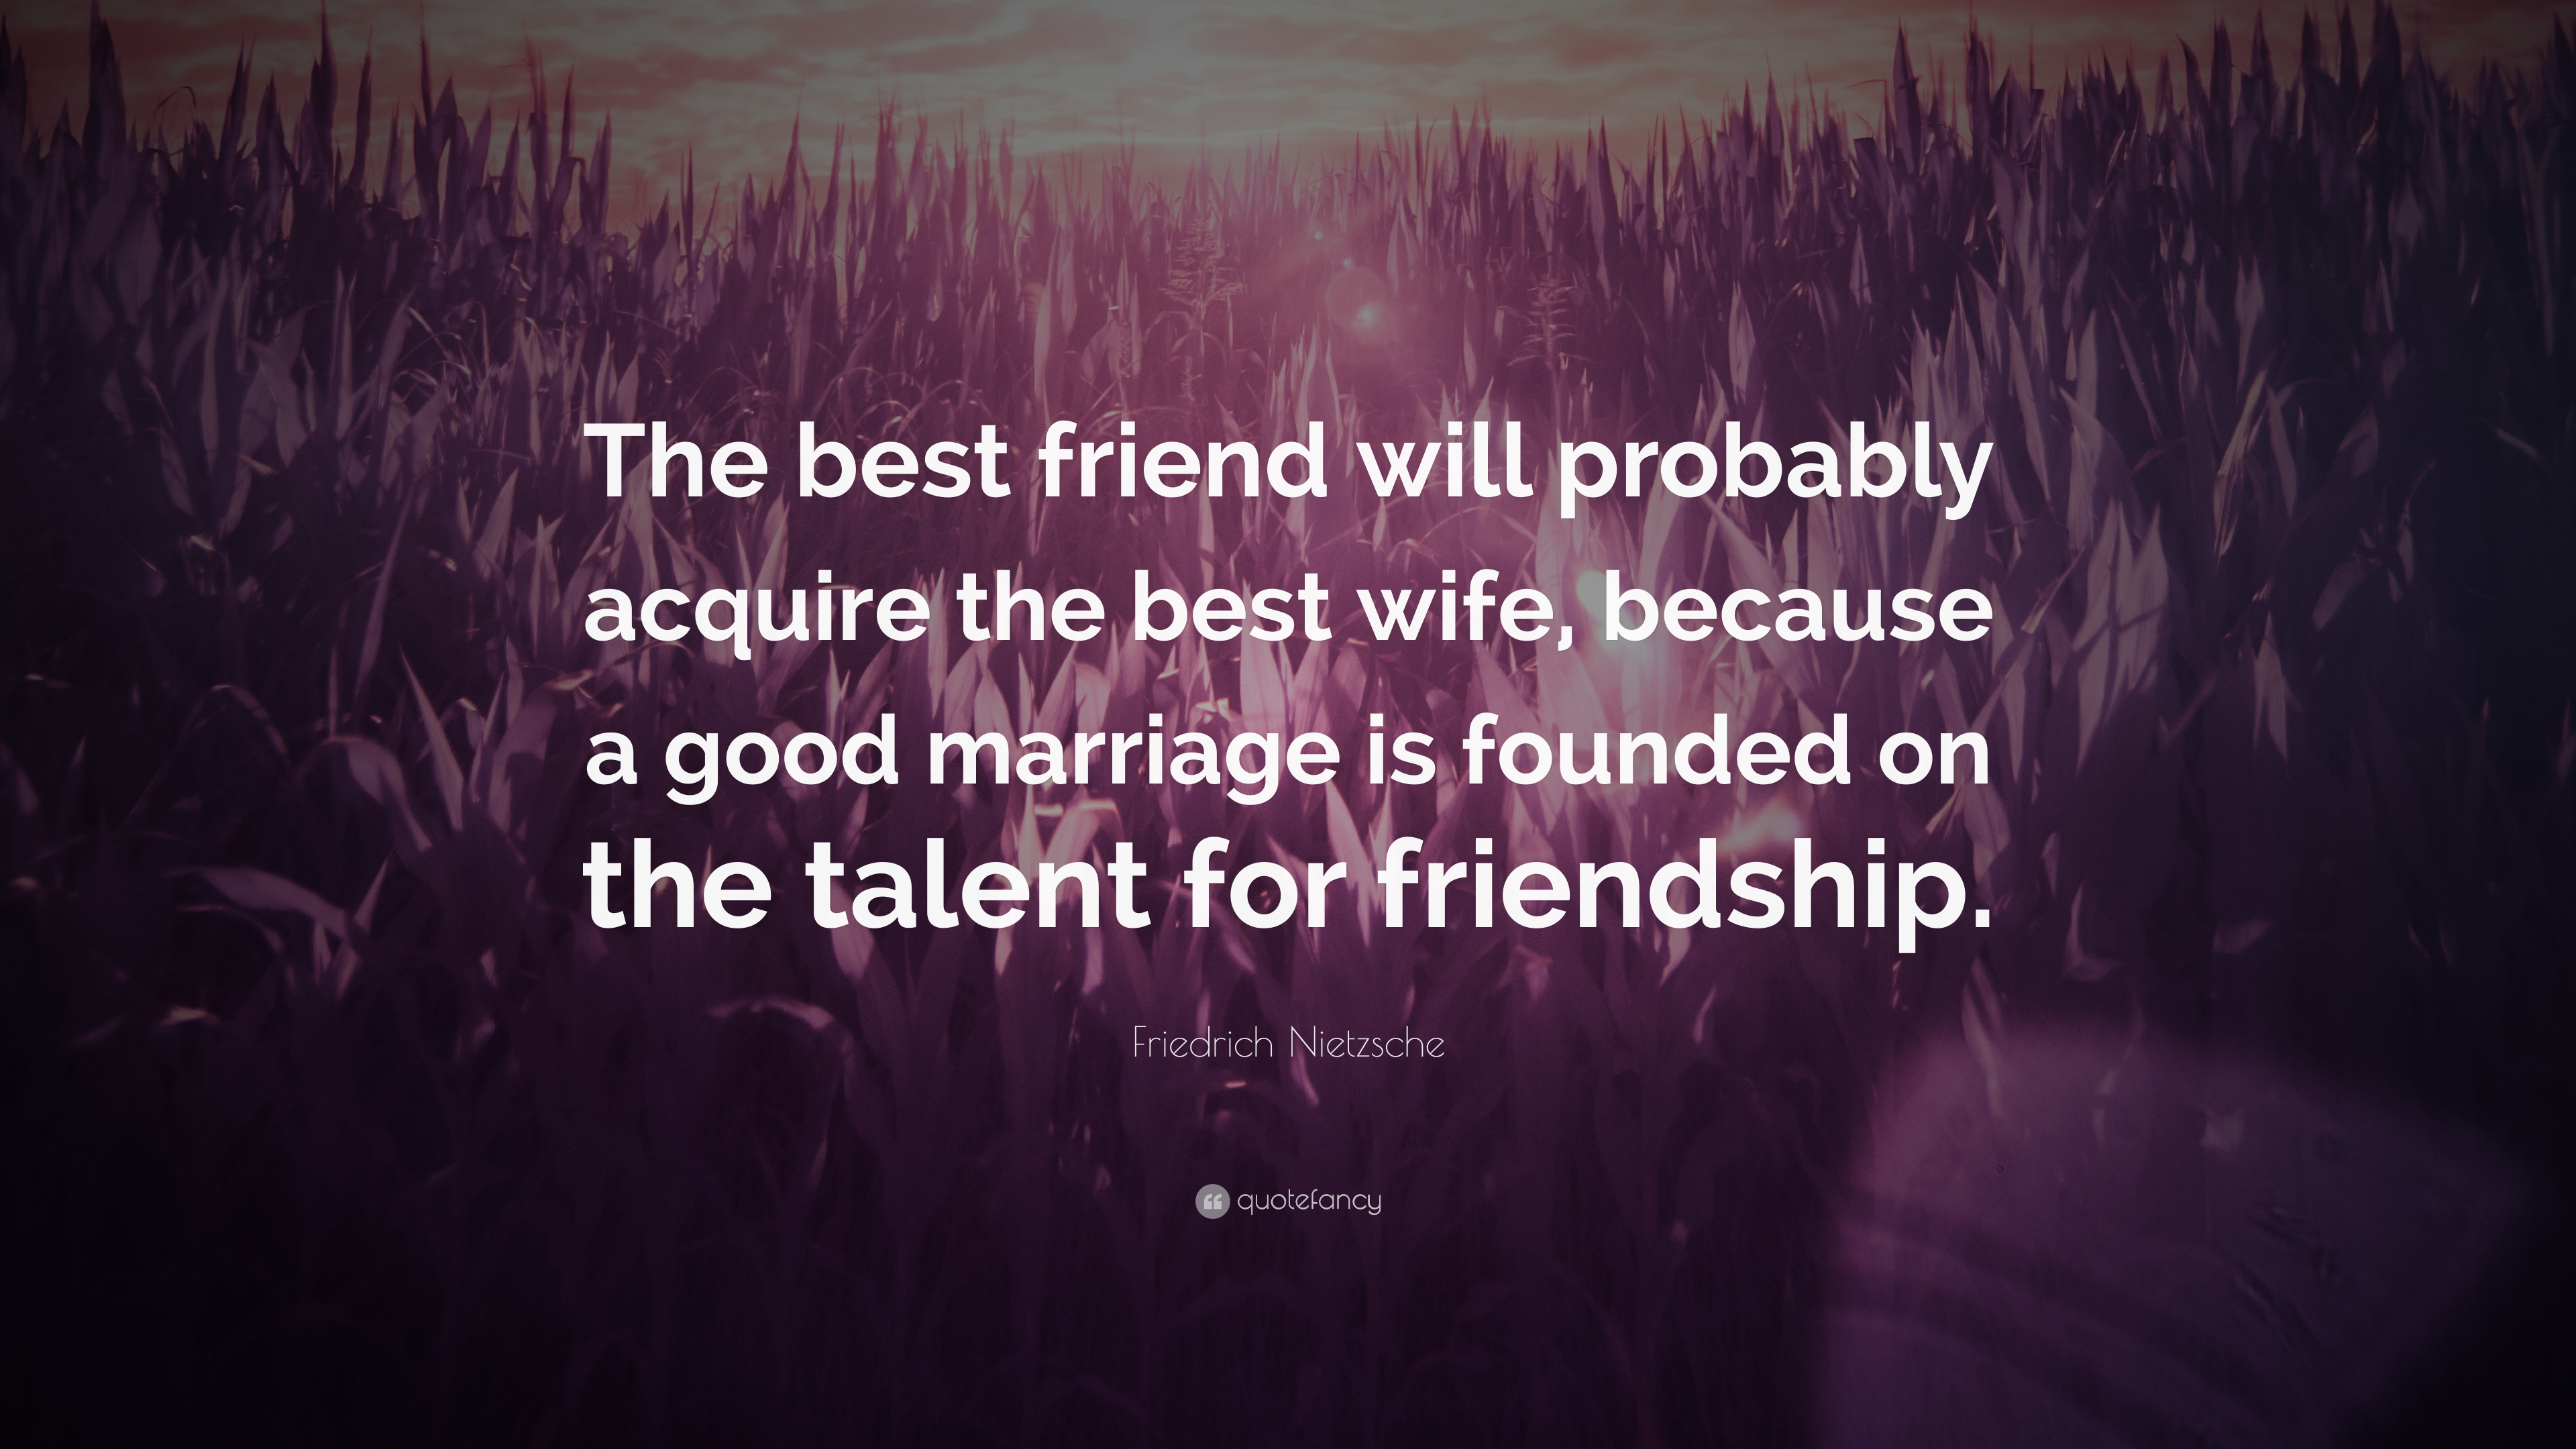 Friedrich Nietzsche Quote The Best Friend Will Probably Acquire